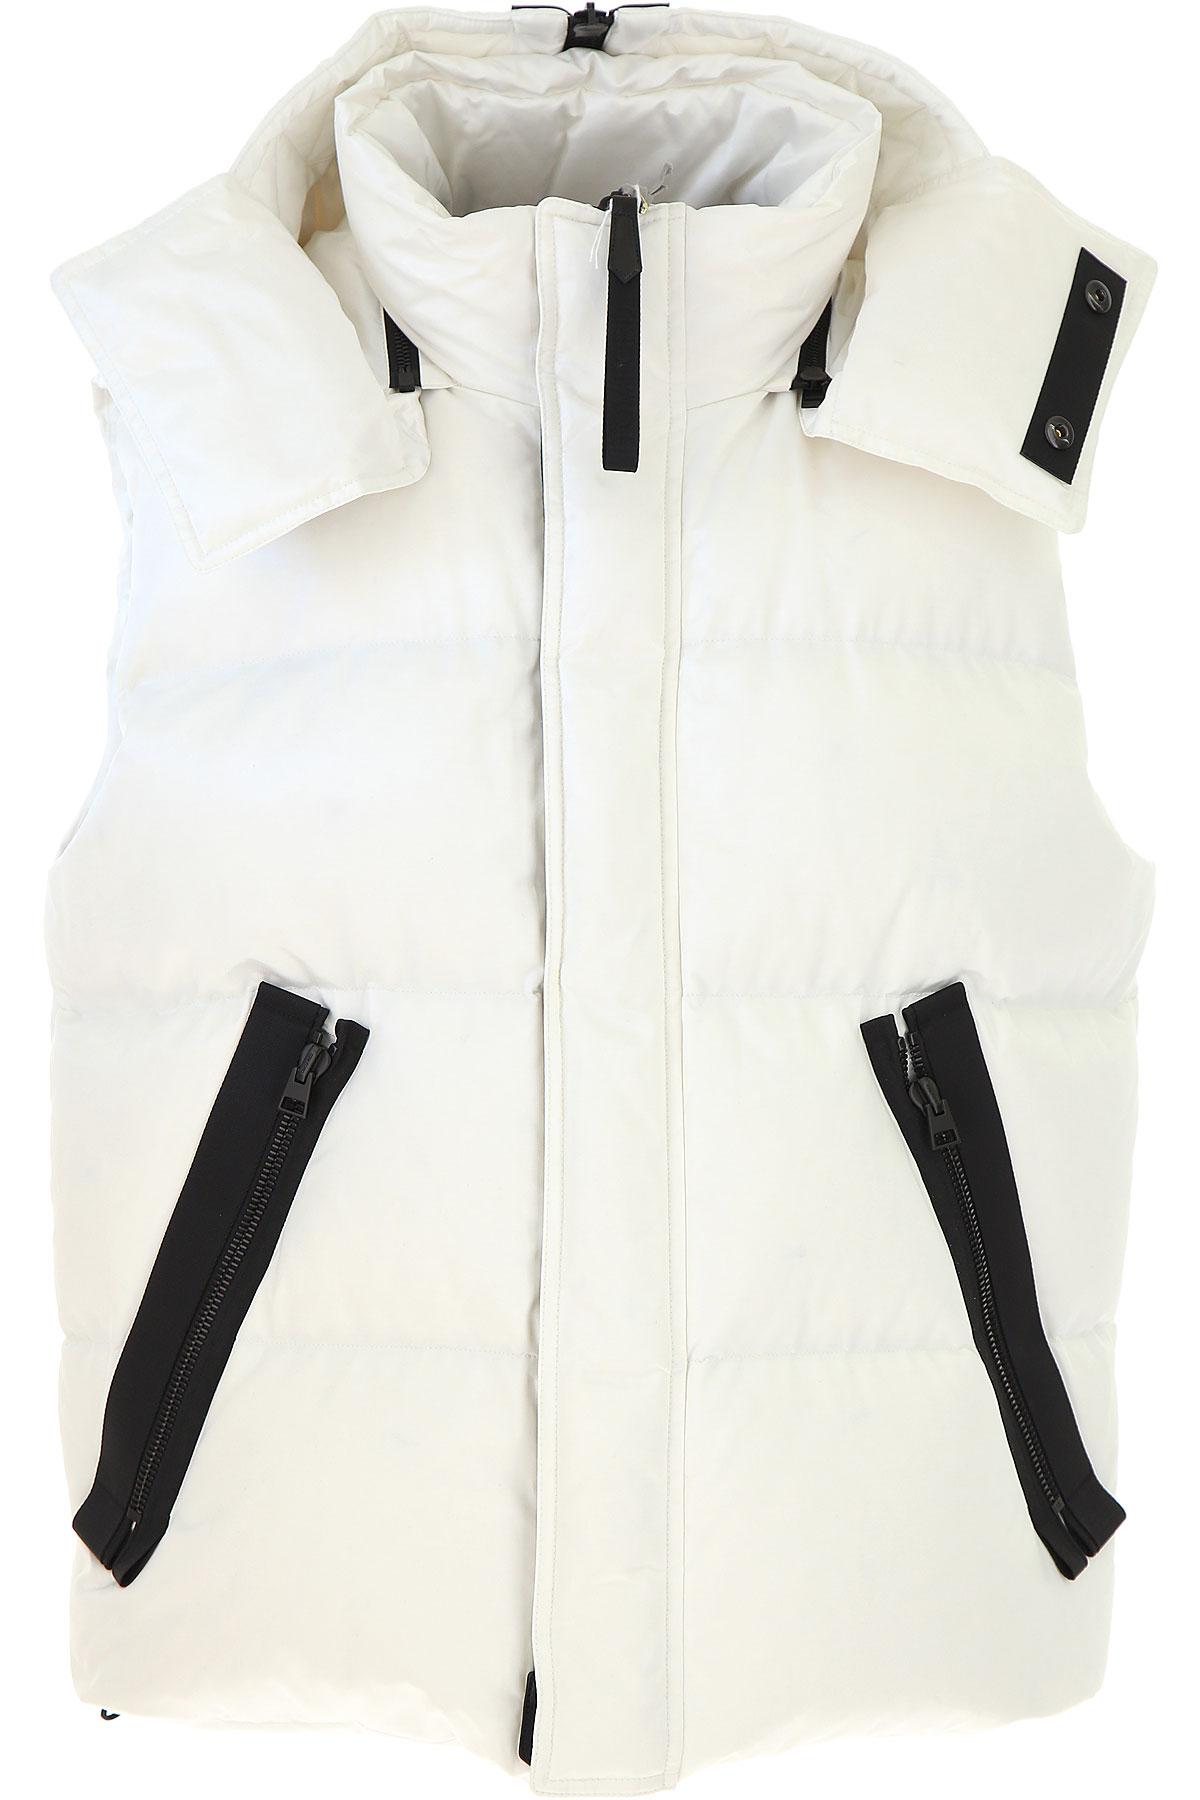 Image of Tom Ford Down Jacket for Men, Puffer Ski Jacket, White, Cotton, 2017, L M XL